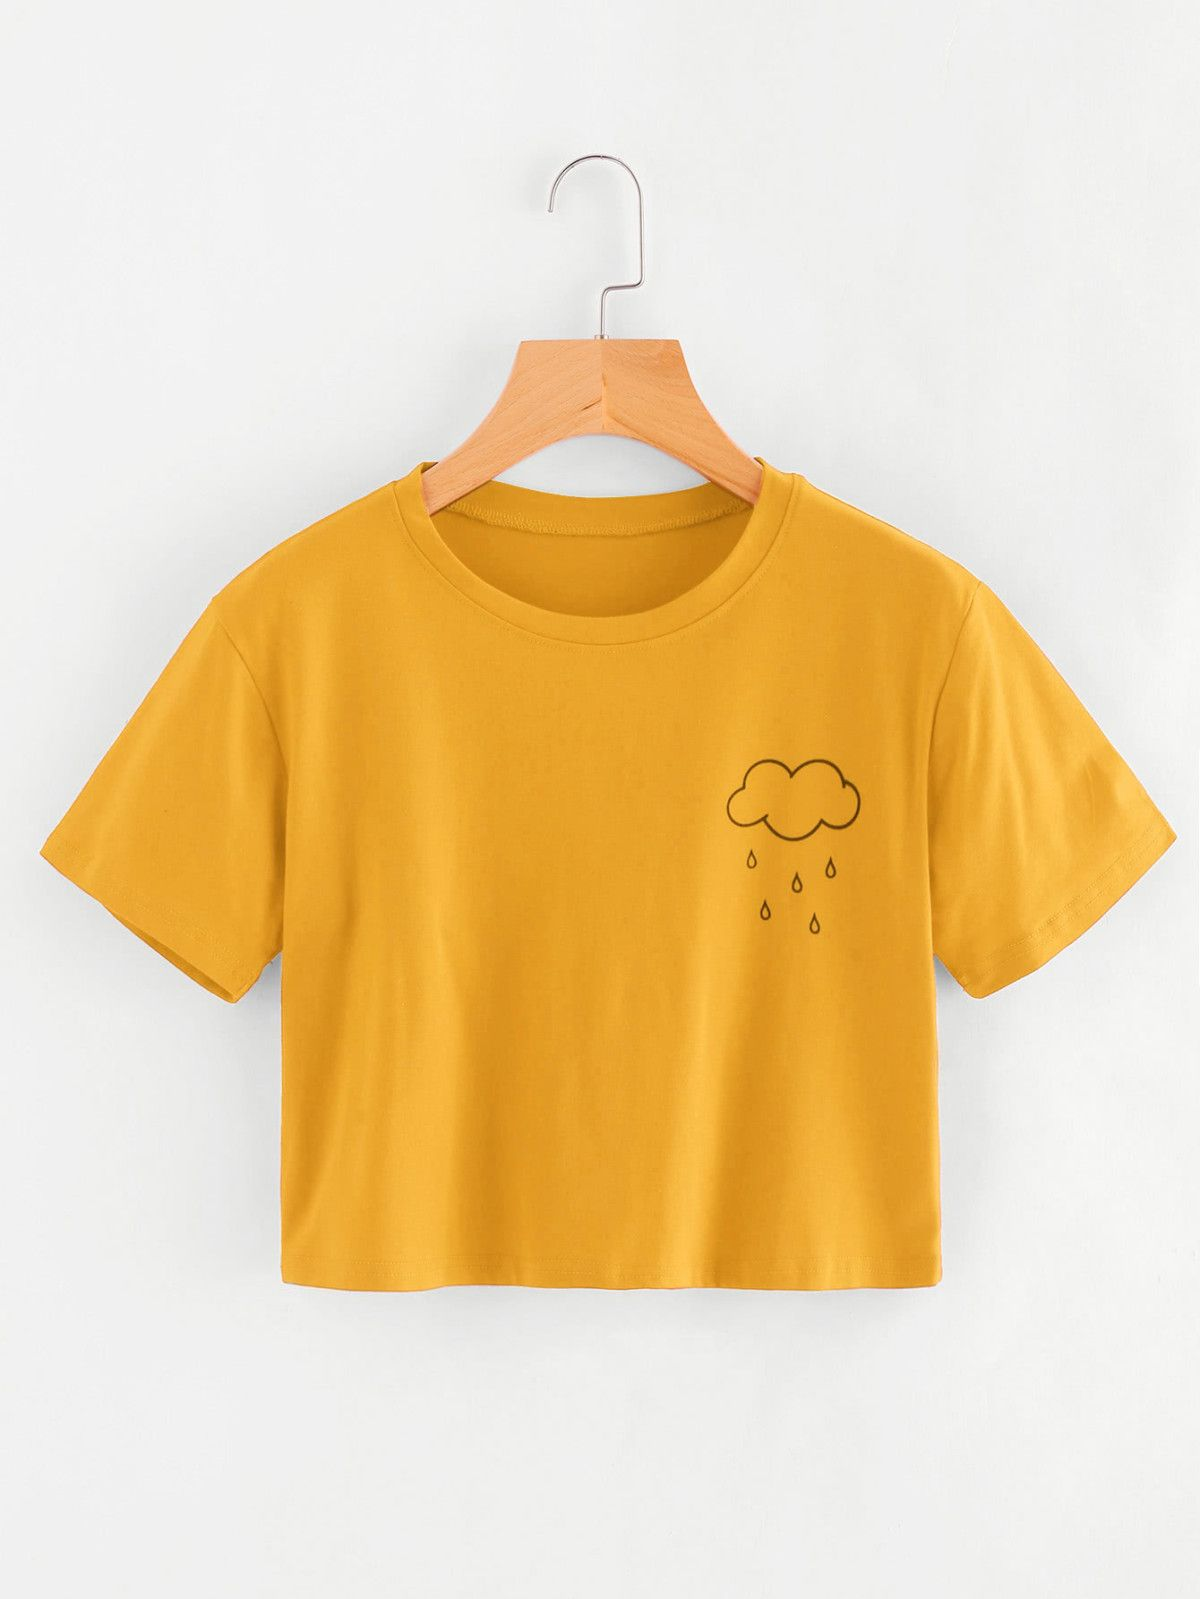 4dbdfd277e693 Yellow crop tee with rain cloud. ROMWE